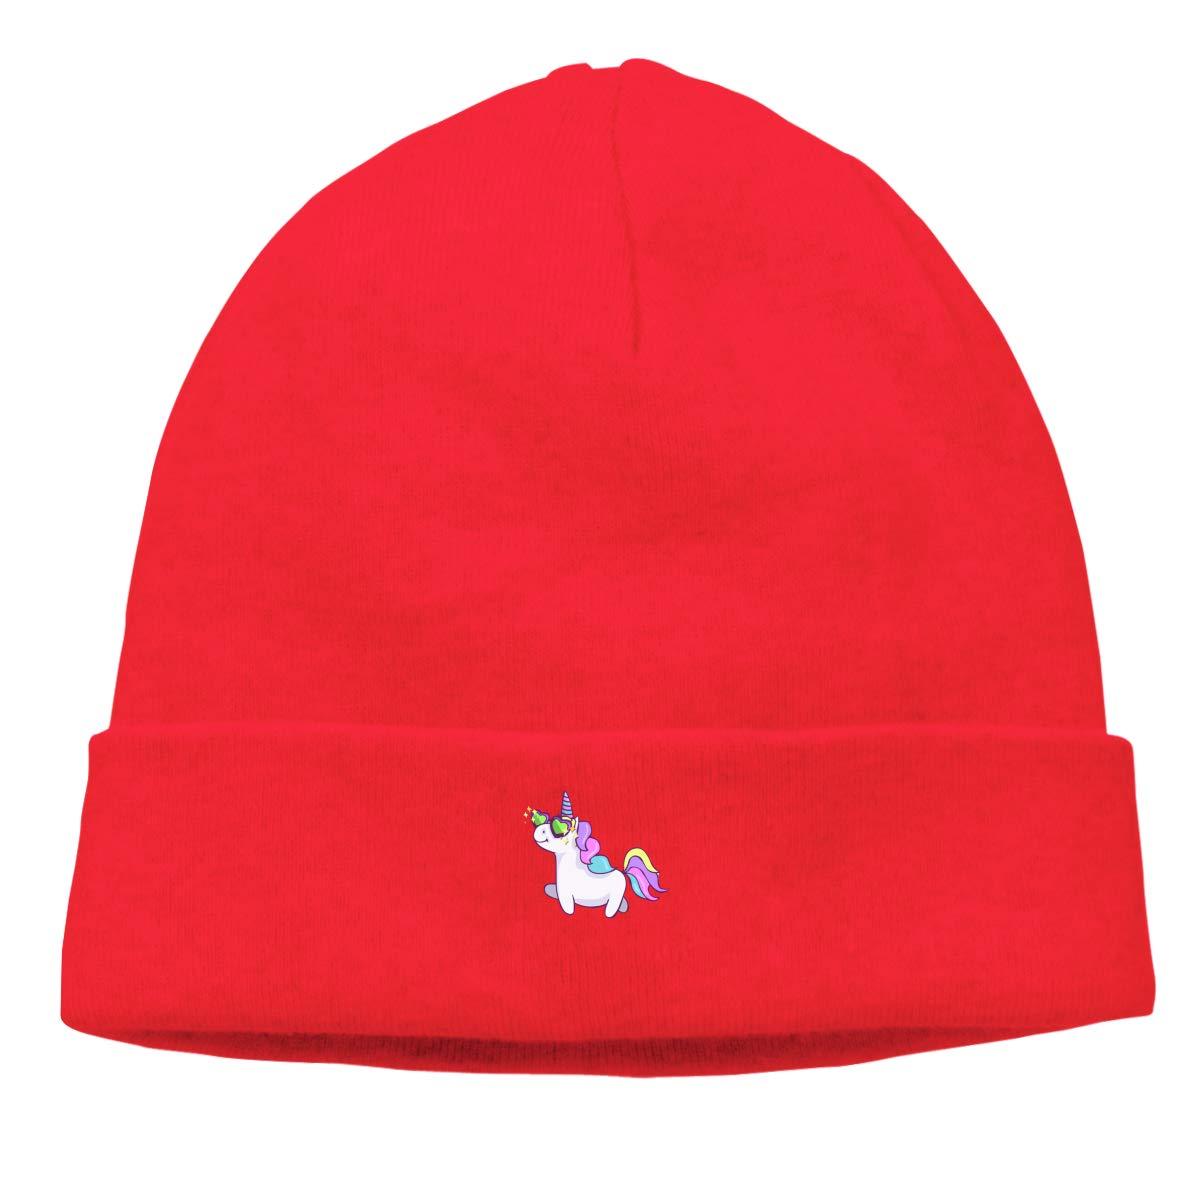 nordic runes Unicorn Animal Beanie Hat Winter Warm Knit Skull Cap for Mens//Womens